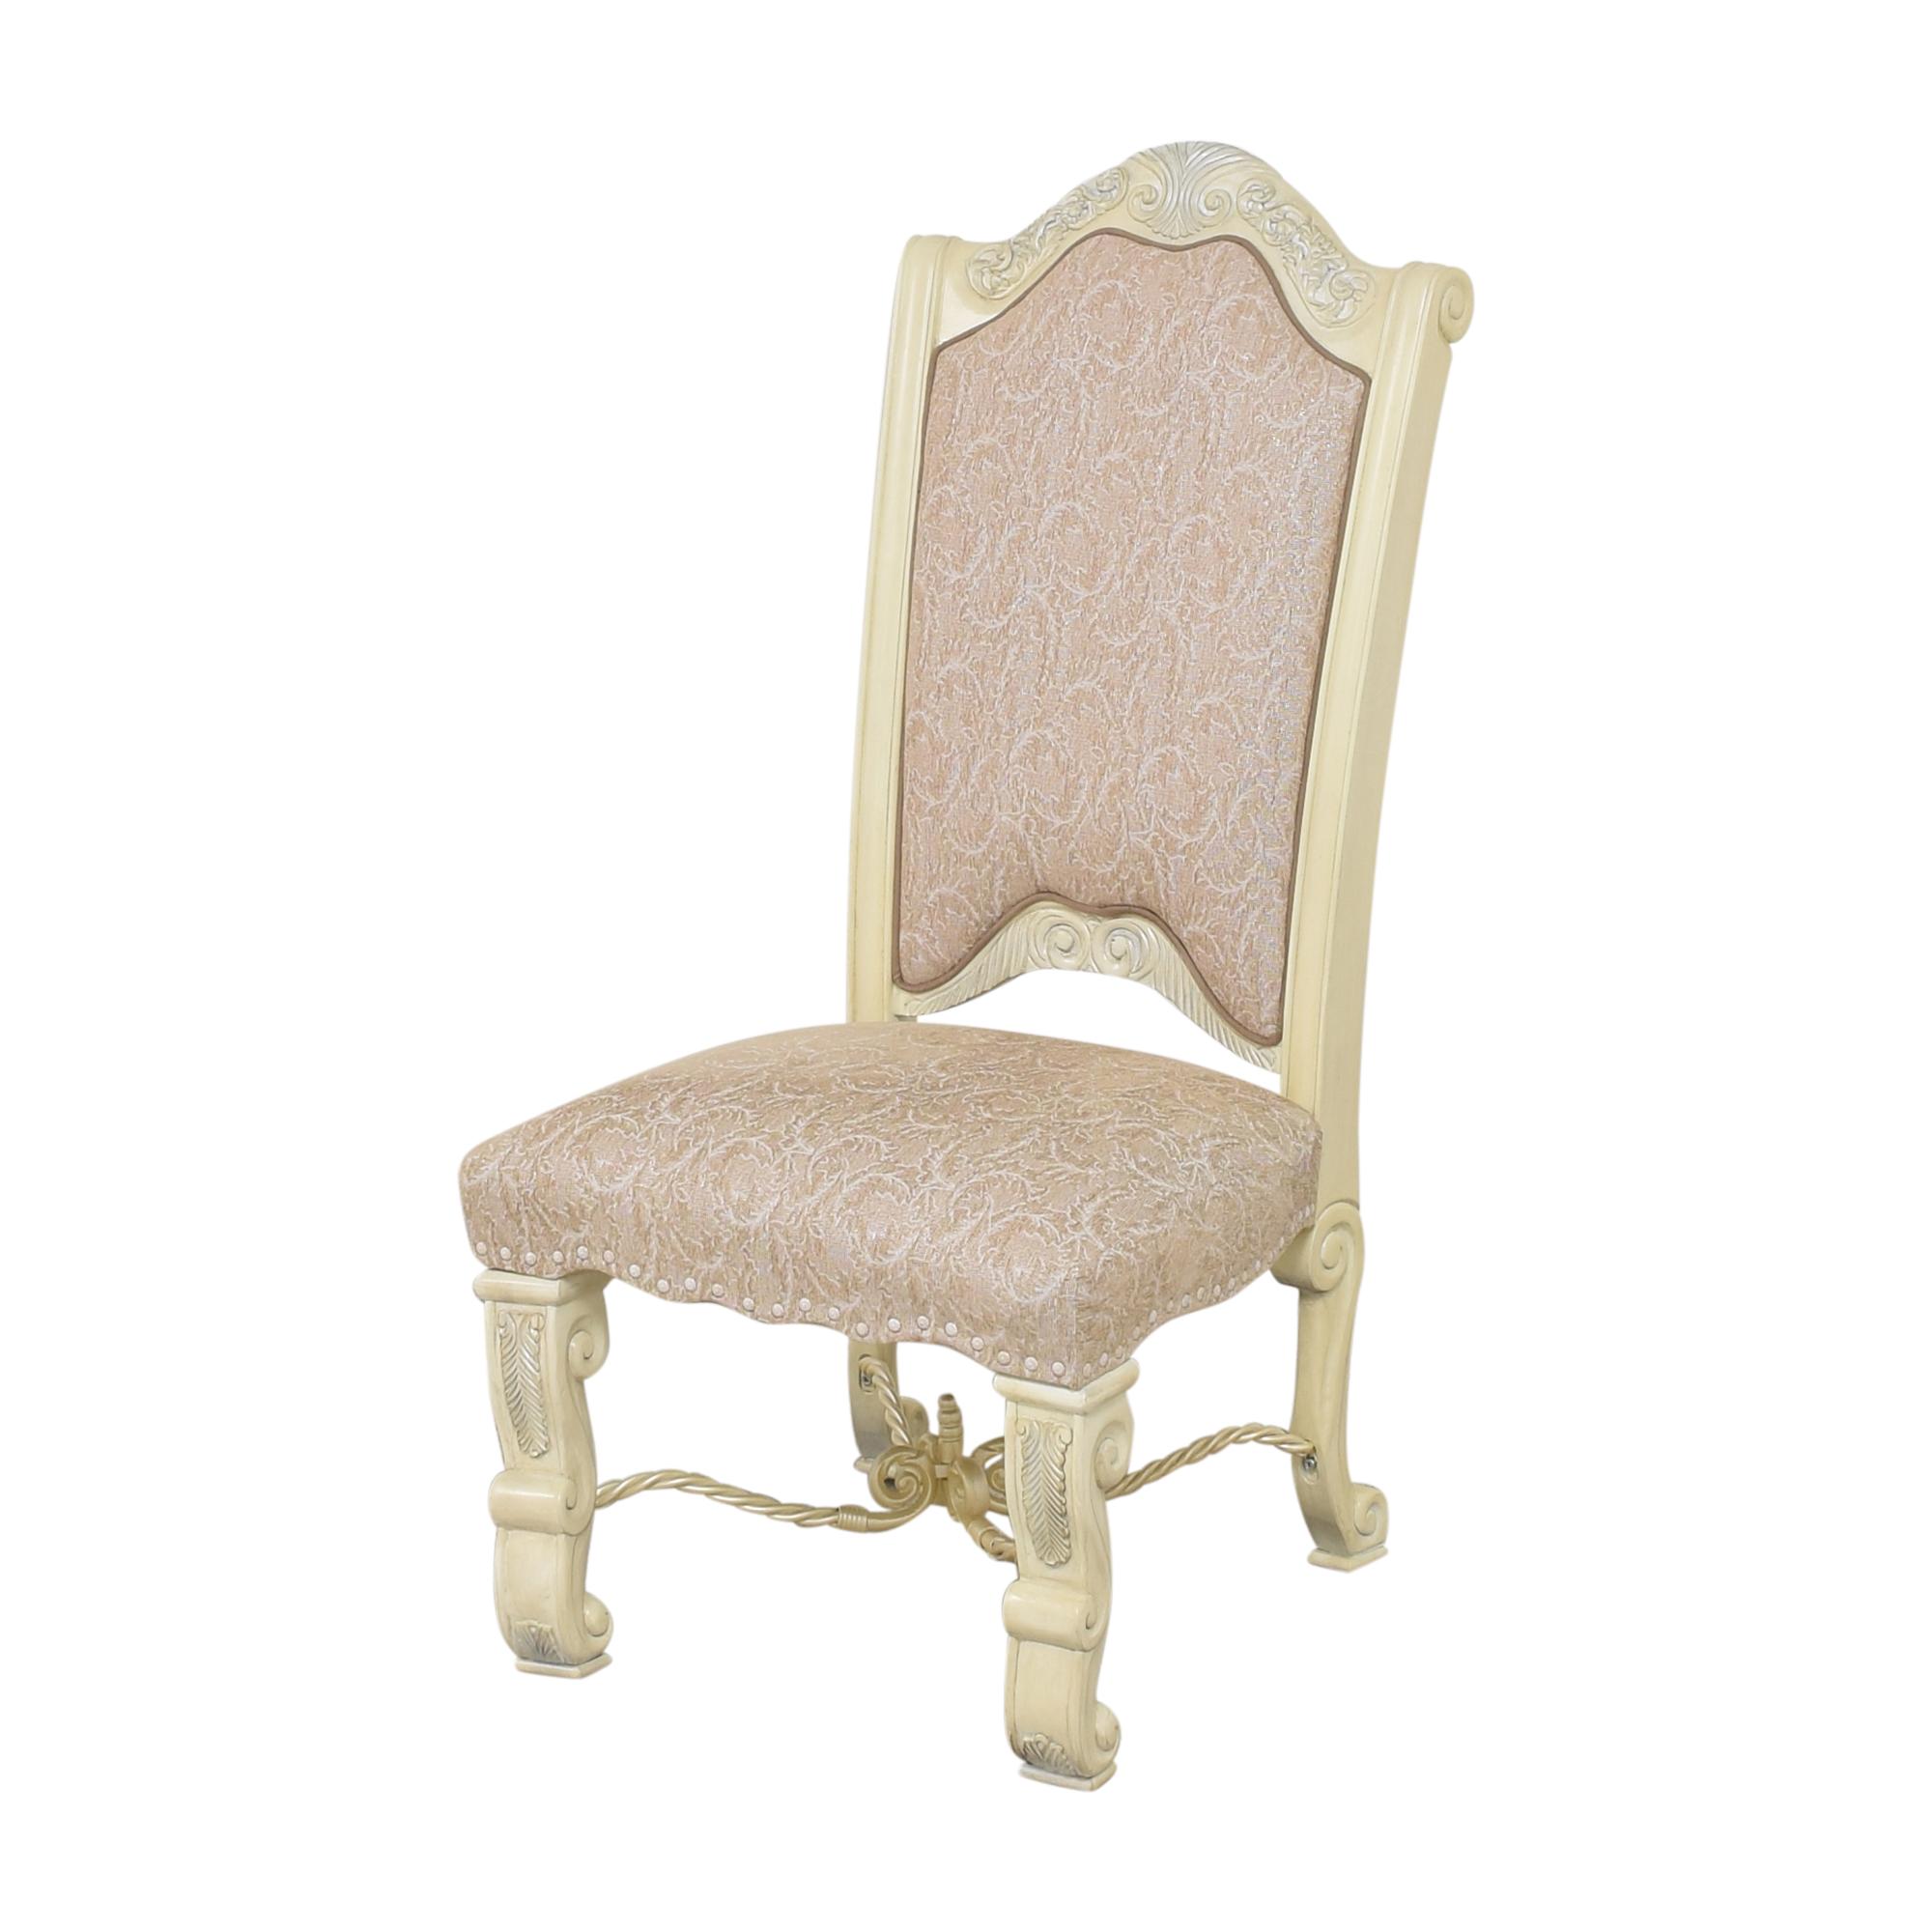 AICO AICO Furniture Monte Carlo Snow Dining Side Chairs nj